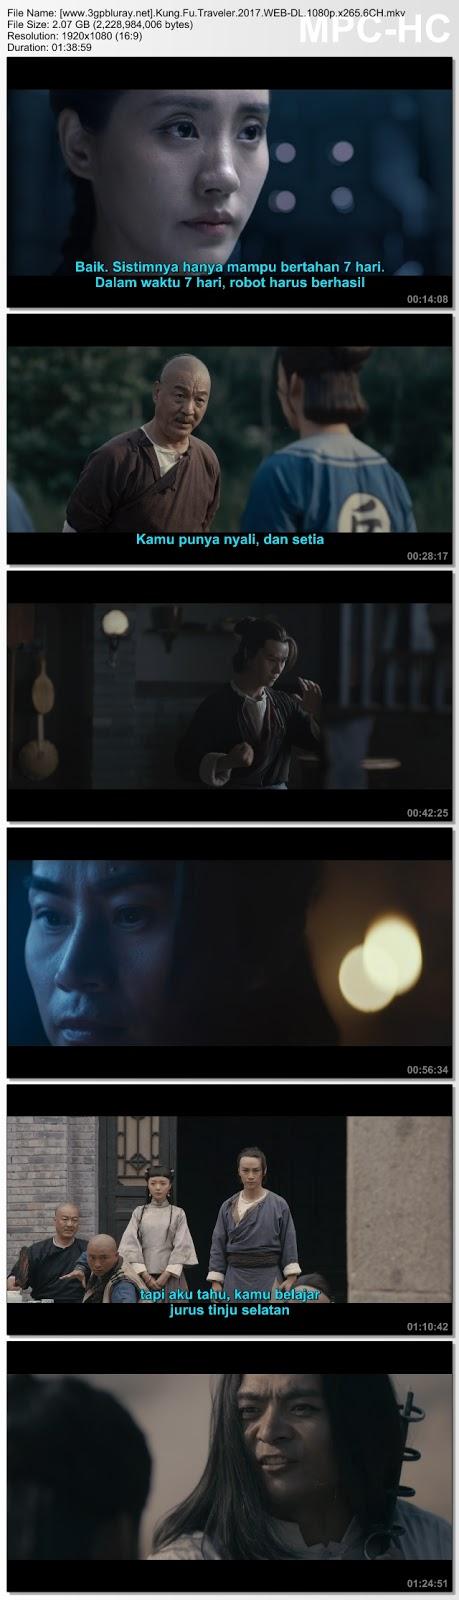 Screenshots Download Film Gratis Hardsub Indo Kung Fu Cyborg (2017) WEB-DL 480p MP4 Subtitle Bahasa Indonesia 3GP